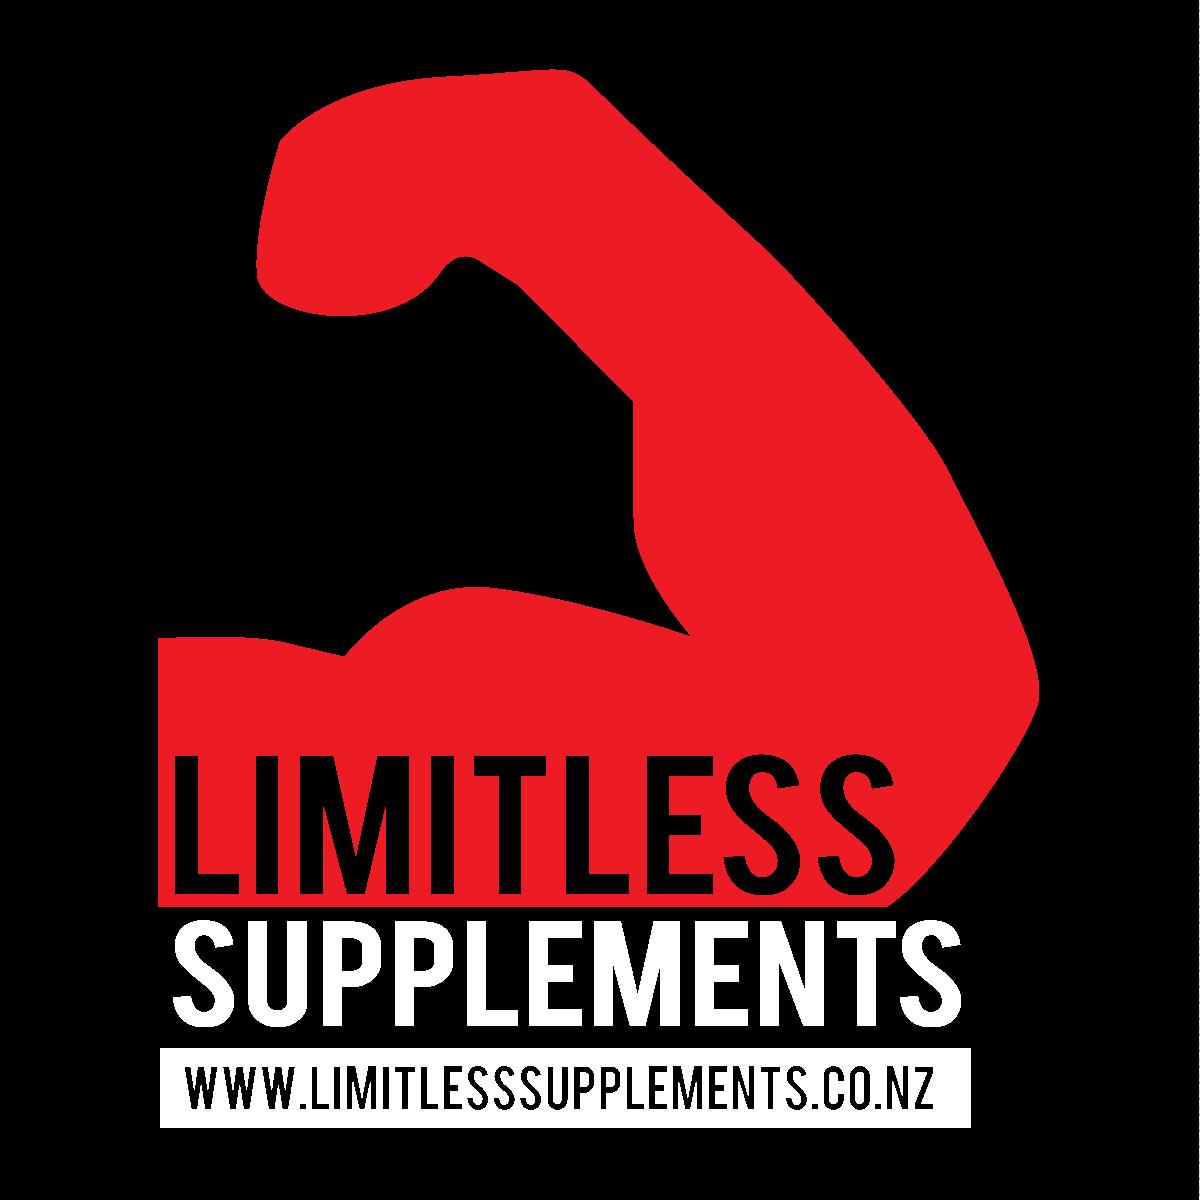 LIMITLESS SUPPLEMENTS